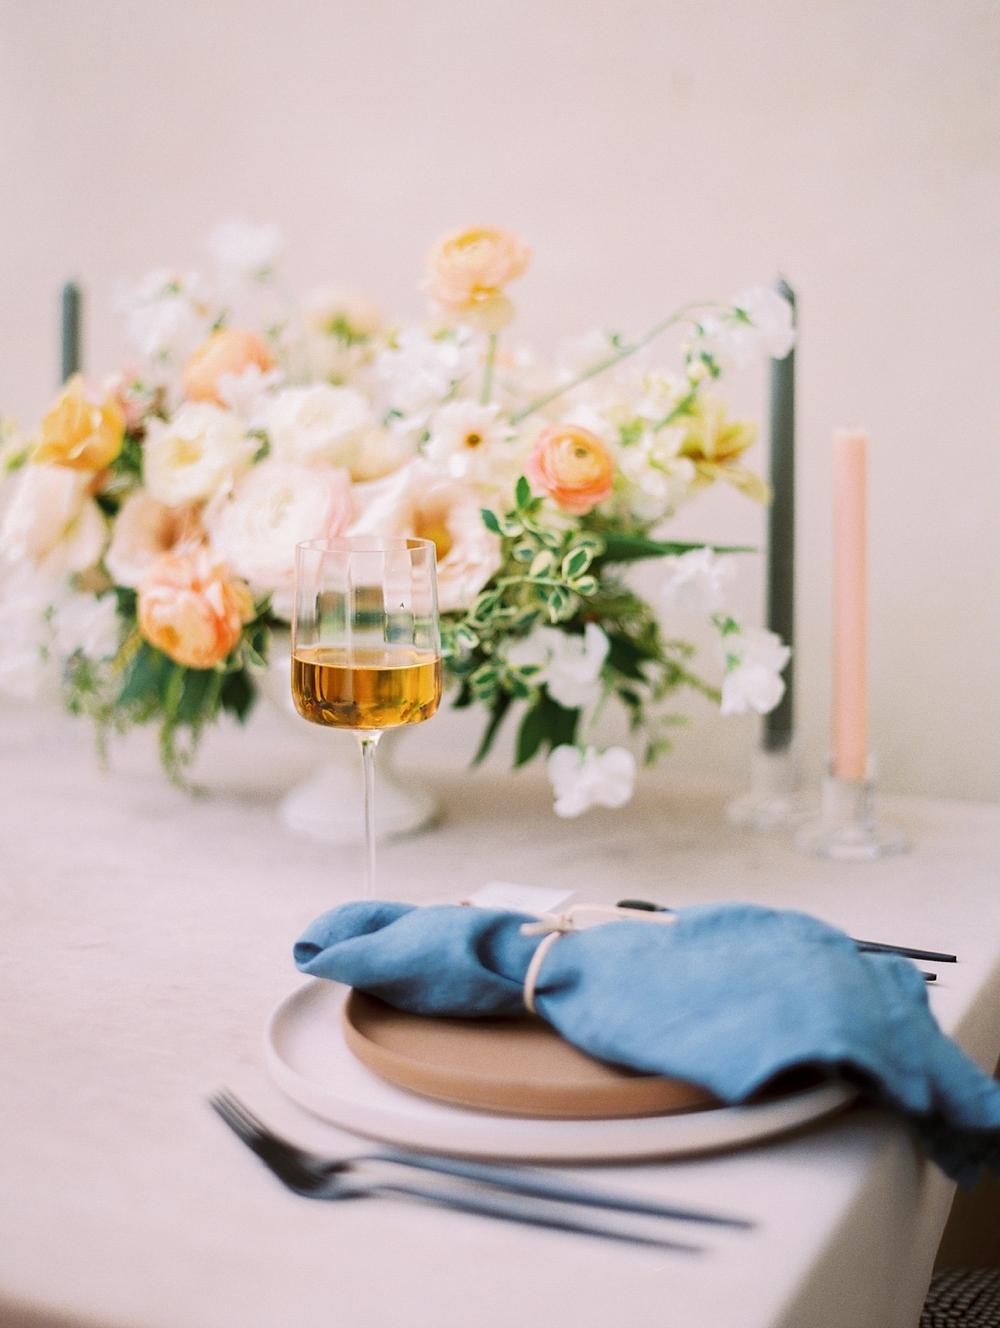 kristin-la-voie-photography-Austin-Wedding-Boudoir-Photographer-Commodore-Perry-Estate-106